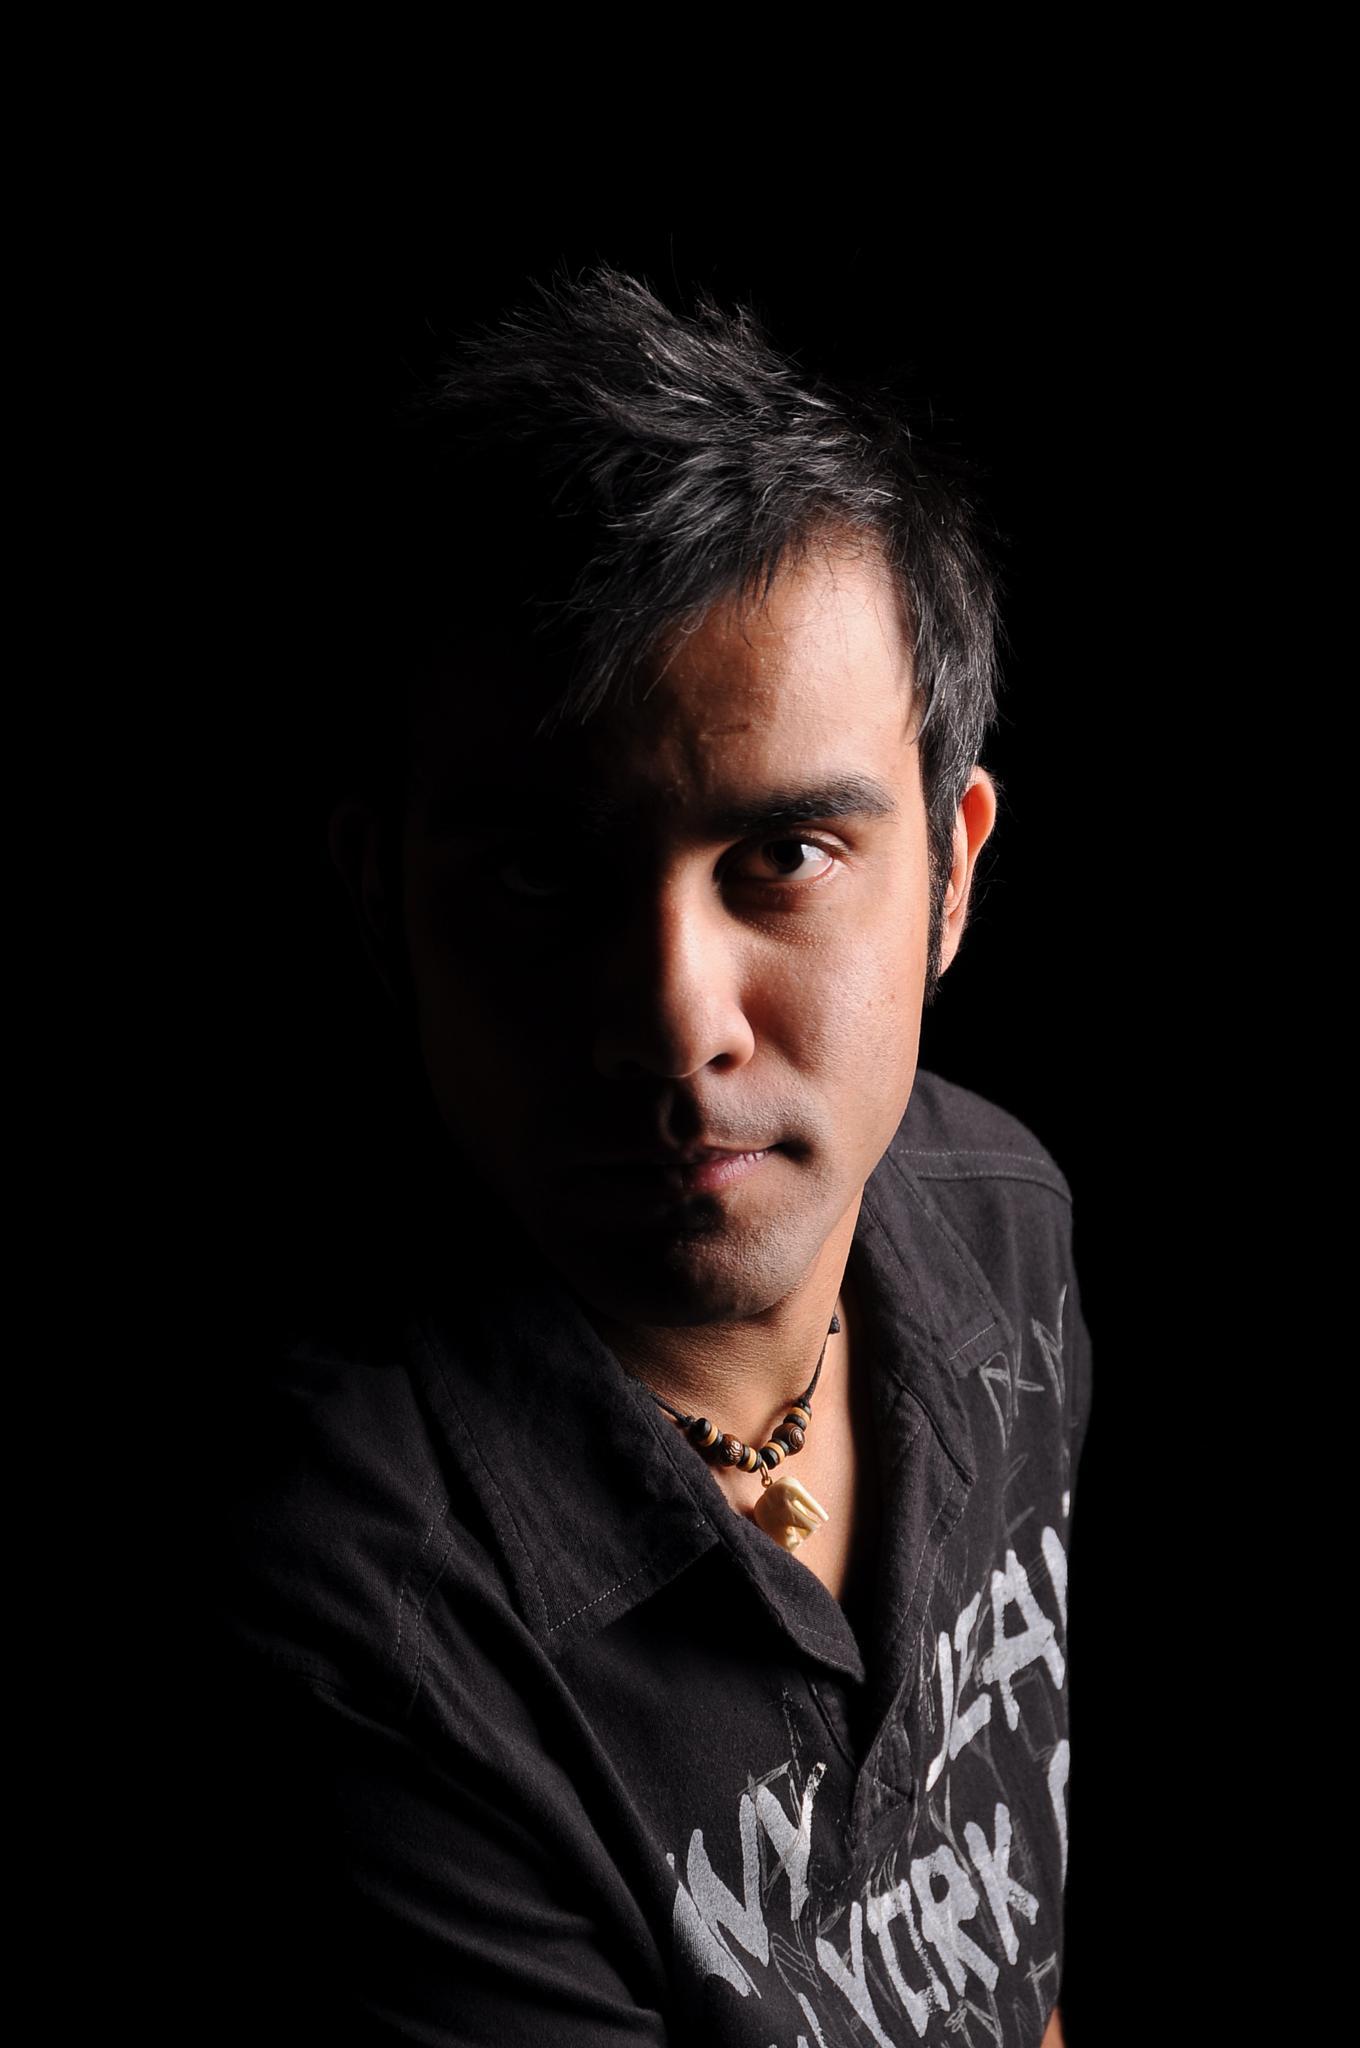 Me,My self by Shahriar Dabiri